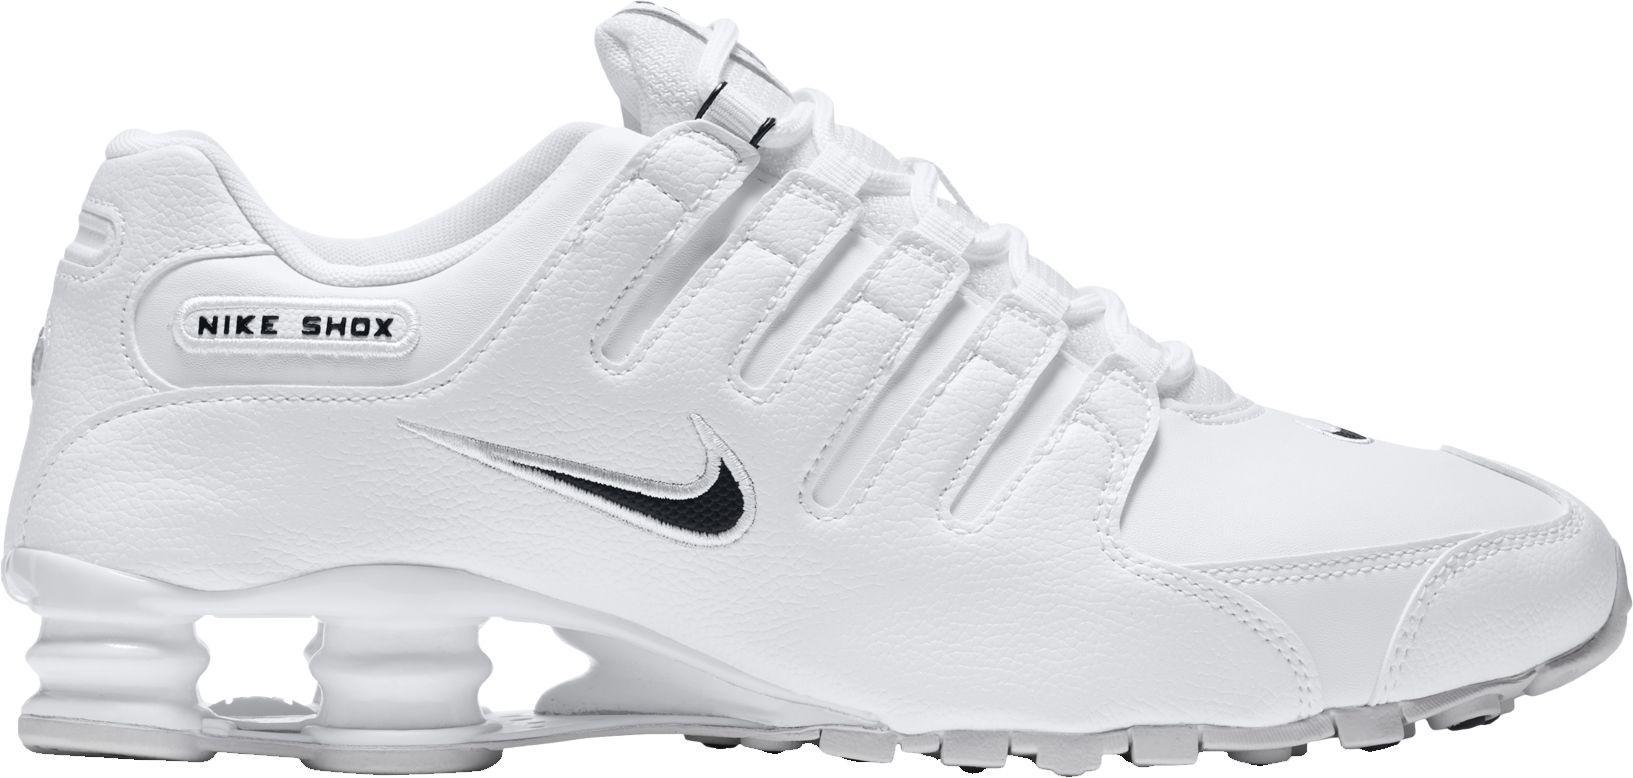 9de2121320c06f Lyst - Nike Shox Nz Shoes in White for Men